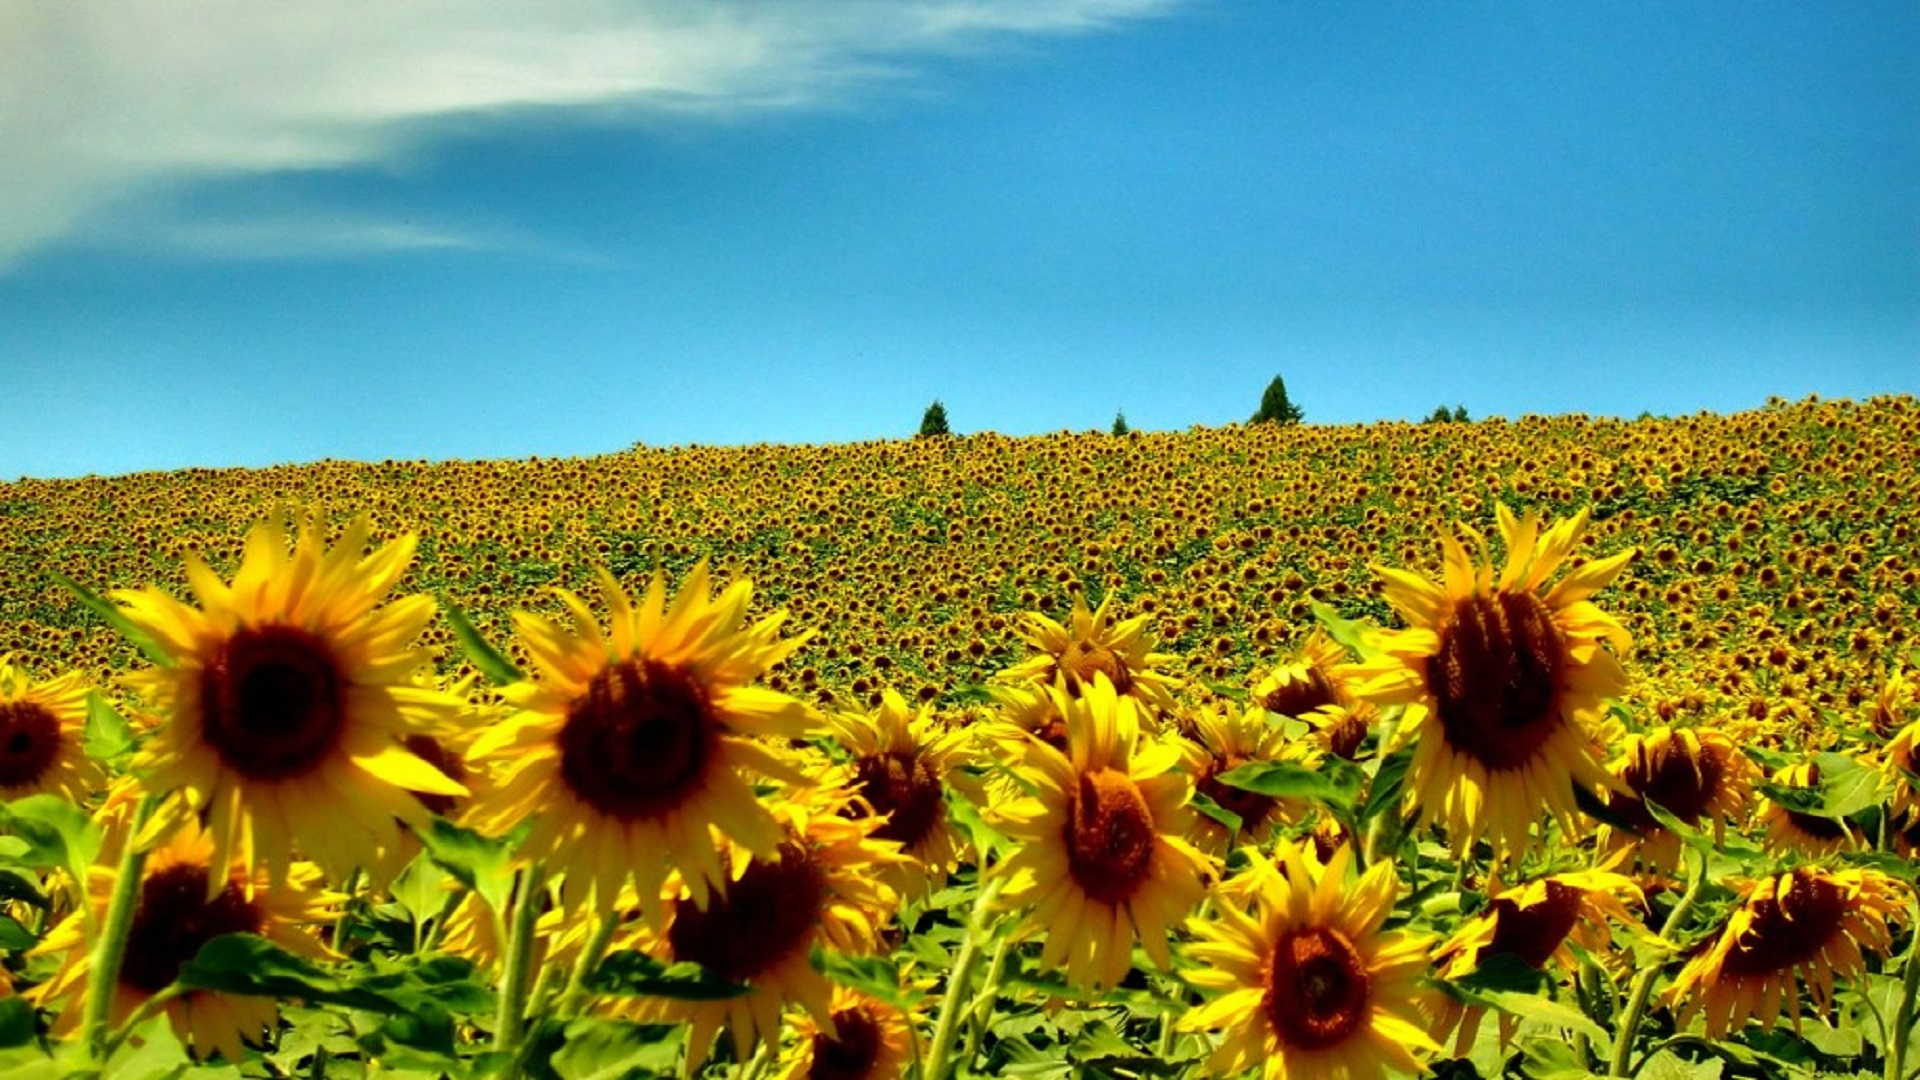 sunflowers-summer-season-hd-free-wallpapers-for-desktops